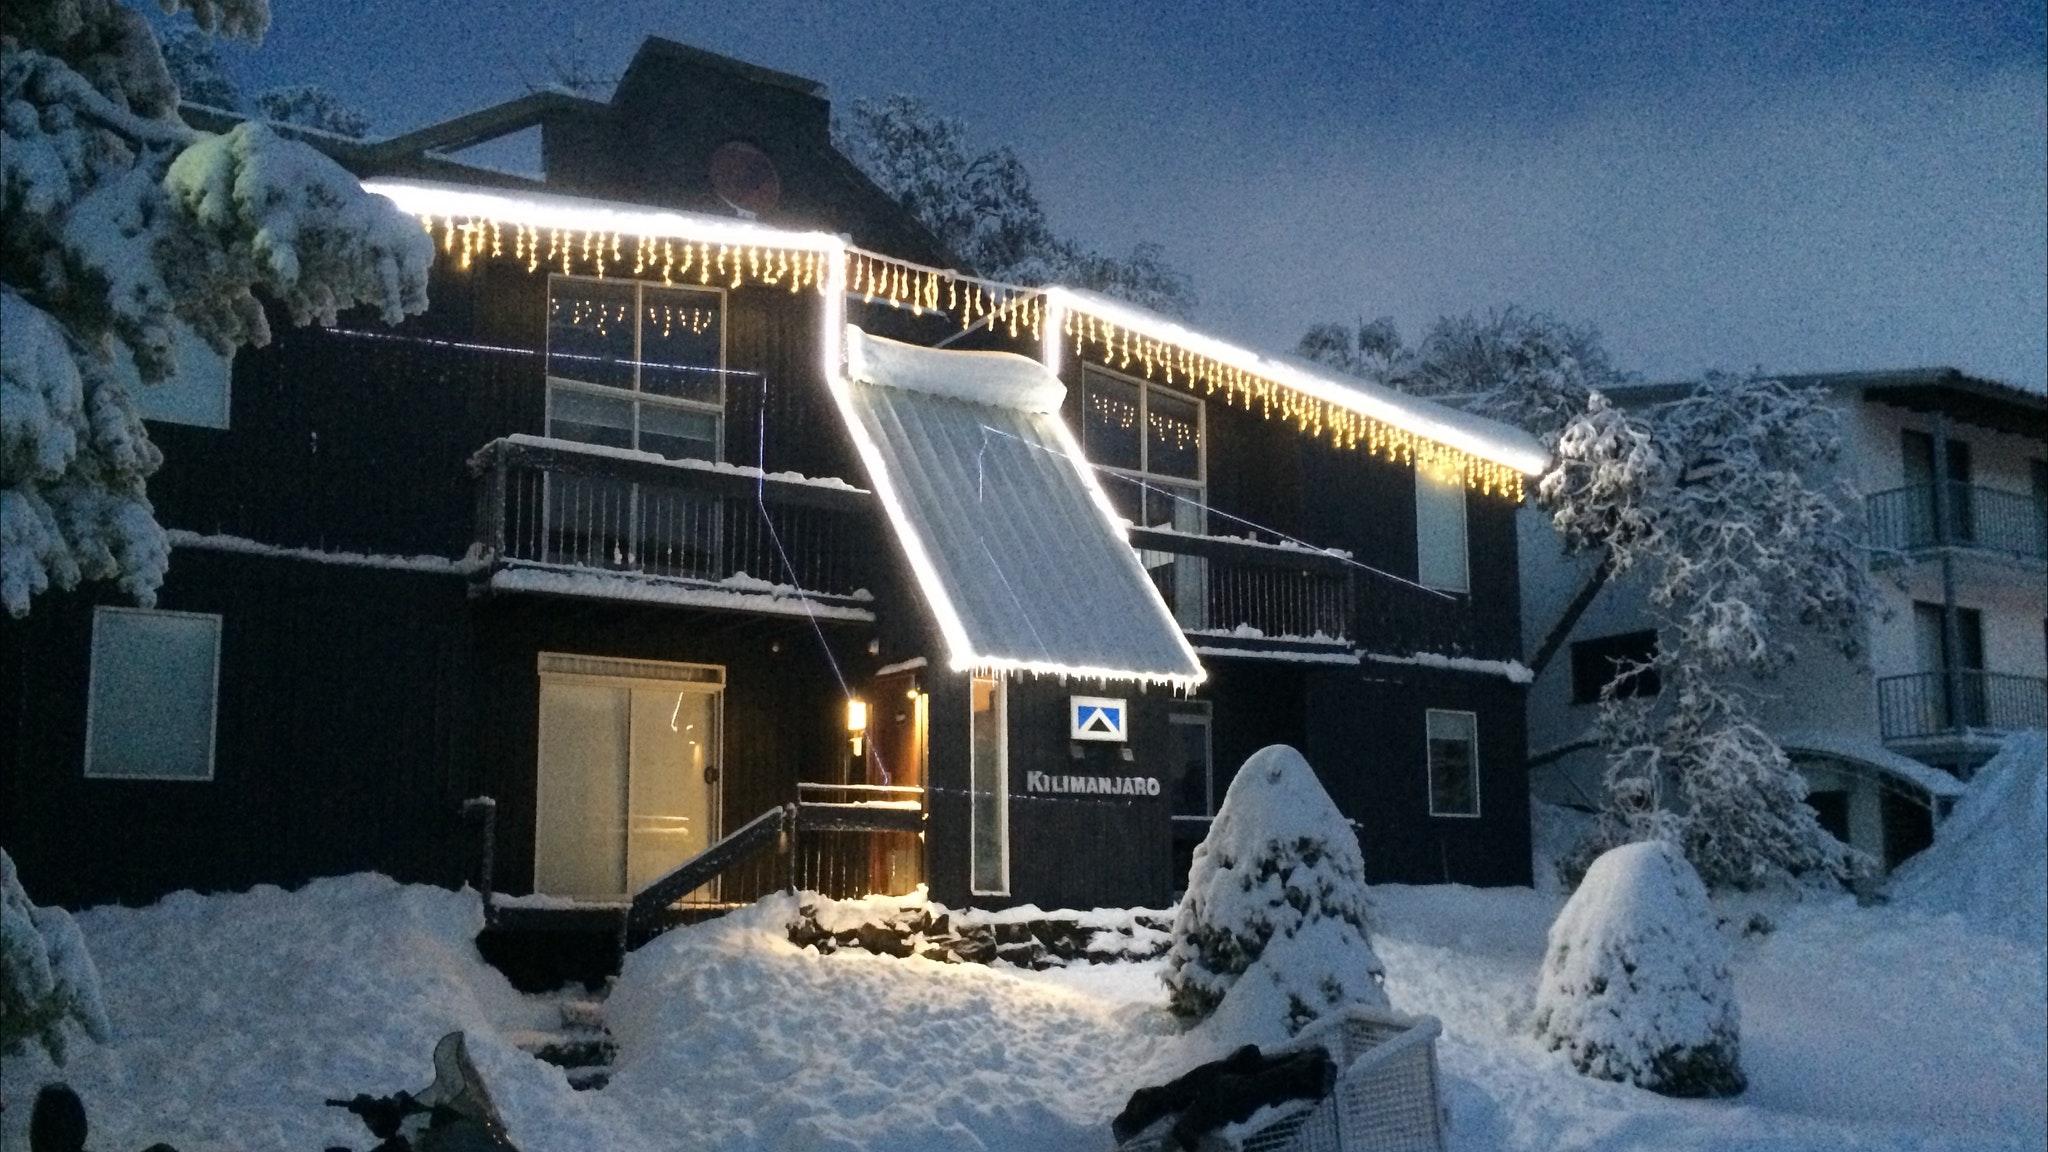 Kilimanjaro Alpine Apartments, Accommodation, High Country, Victoria ...